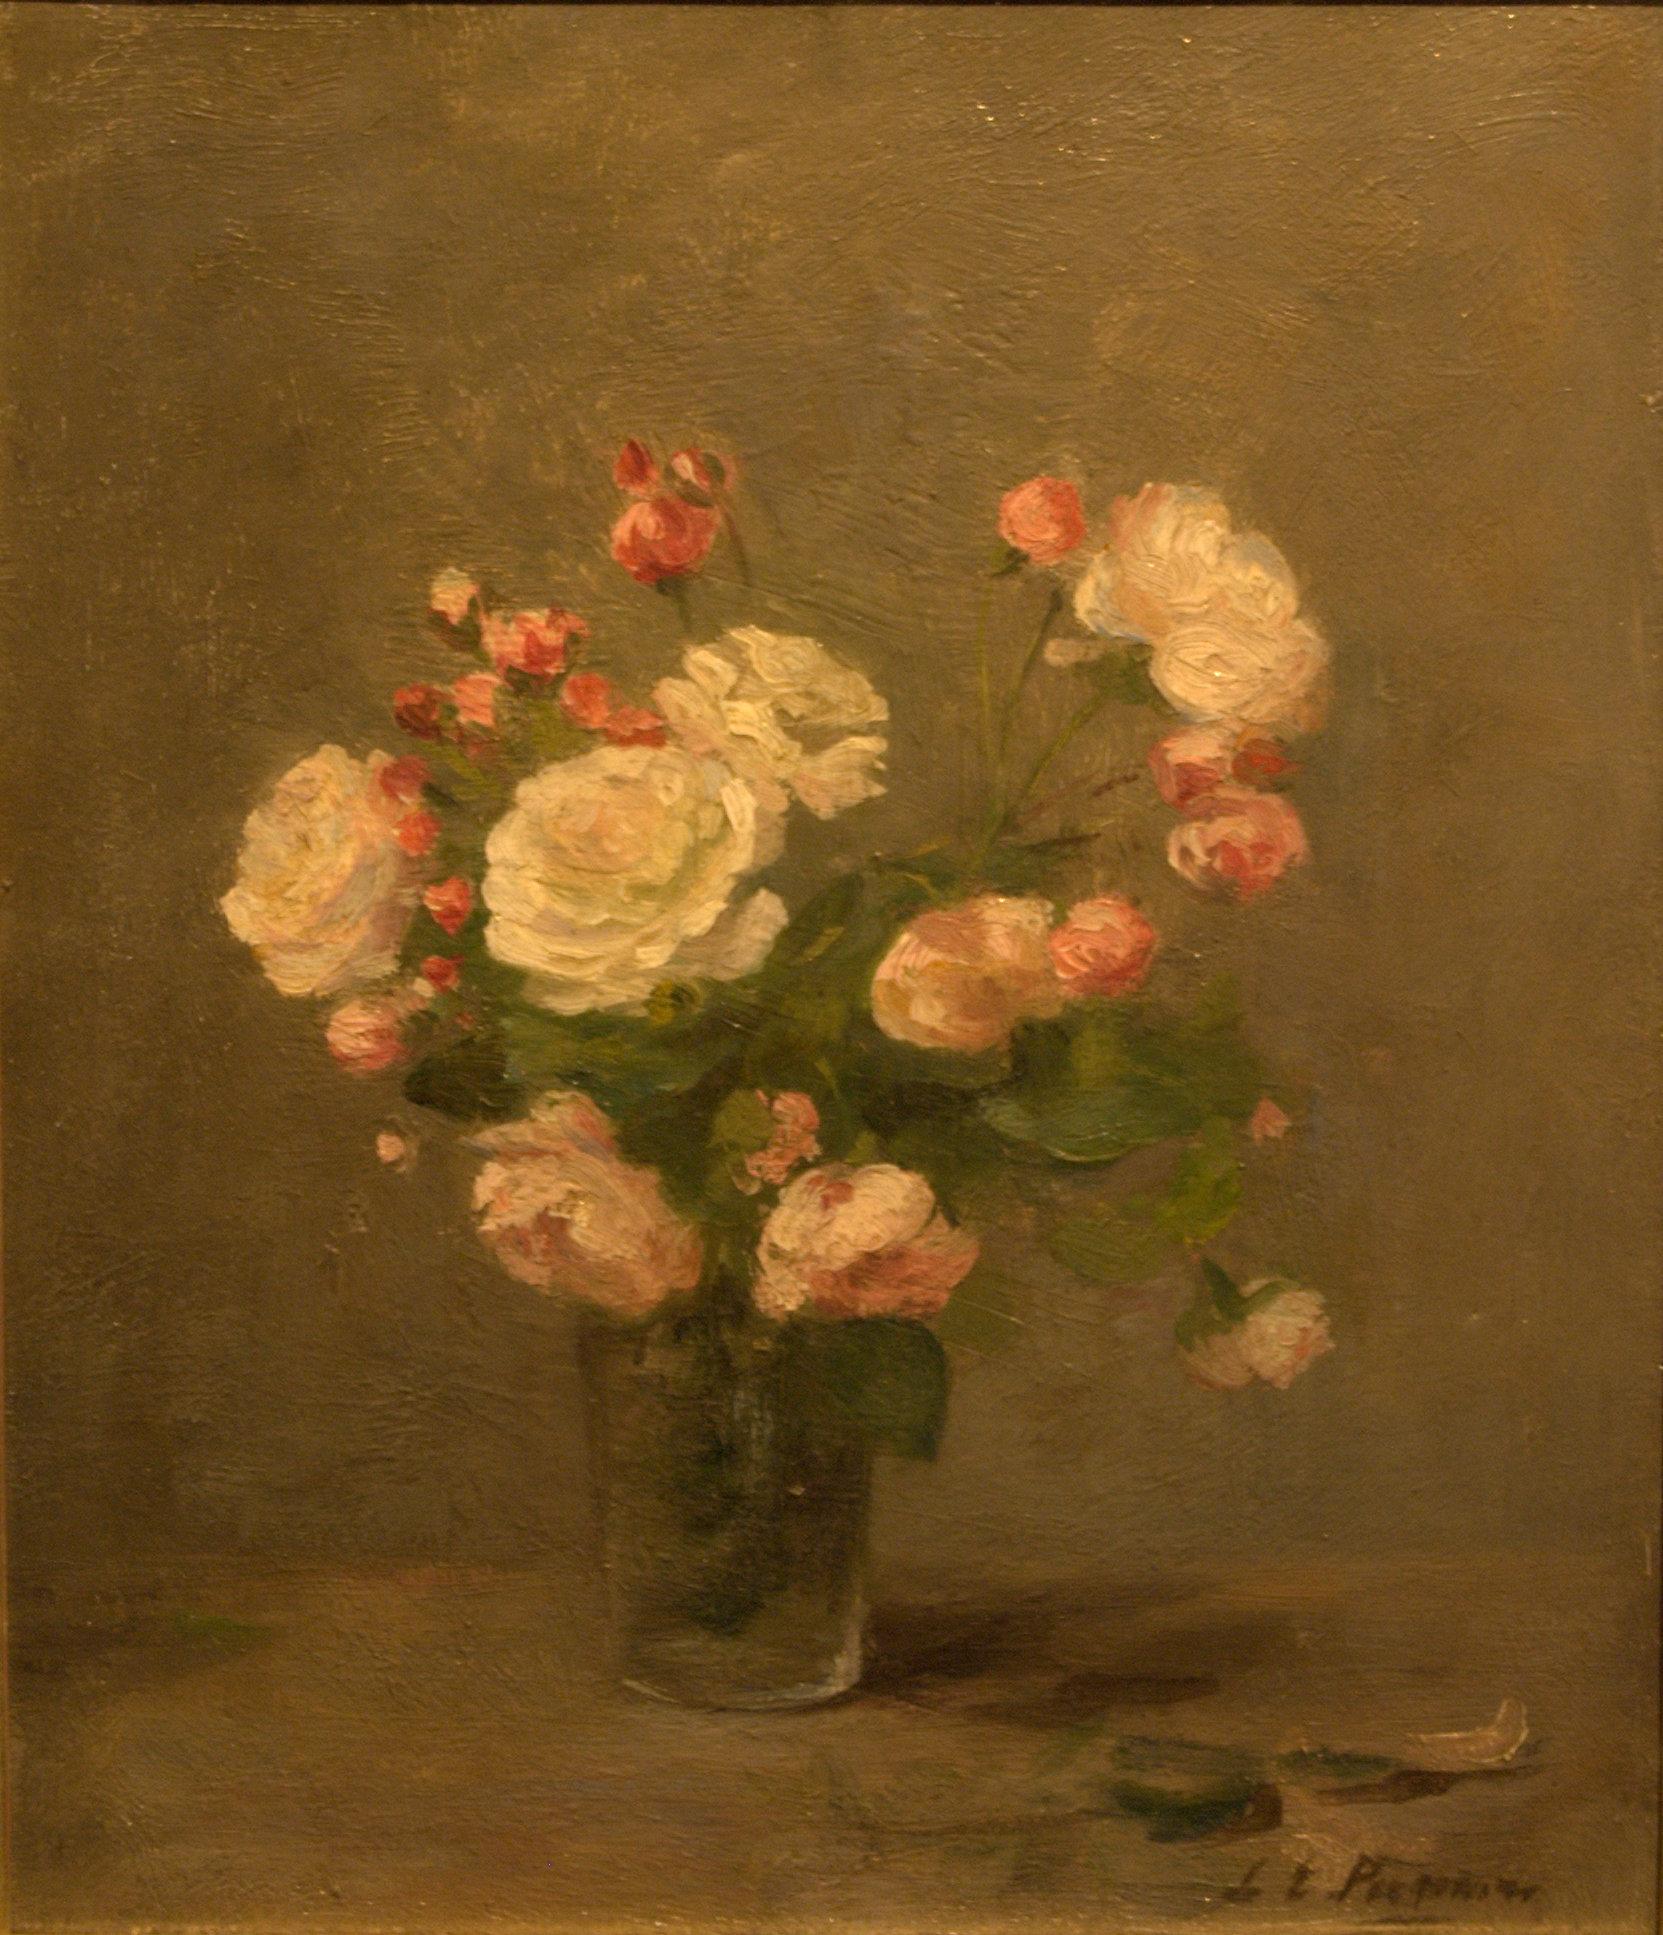 Louise E. Perman